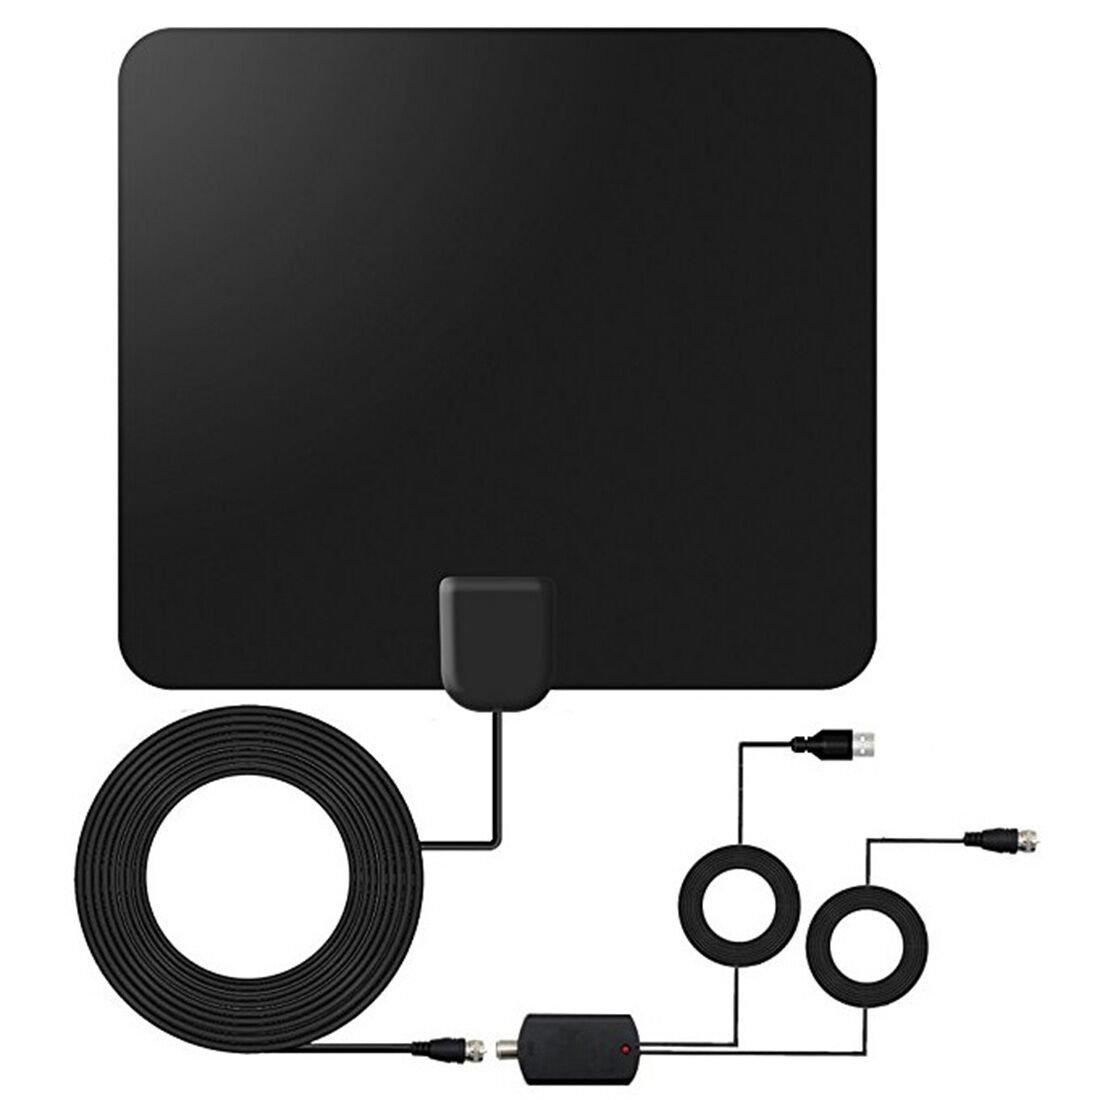 Cheap Homemade Digital Antenna For Tv, find Homemade Digital